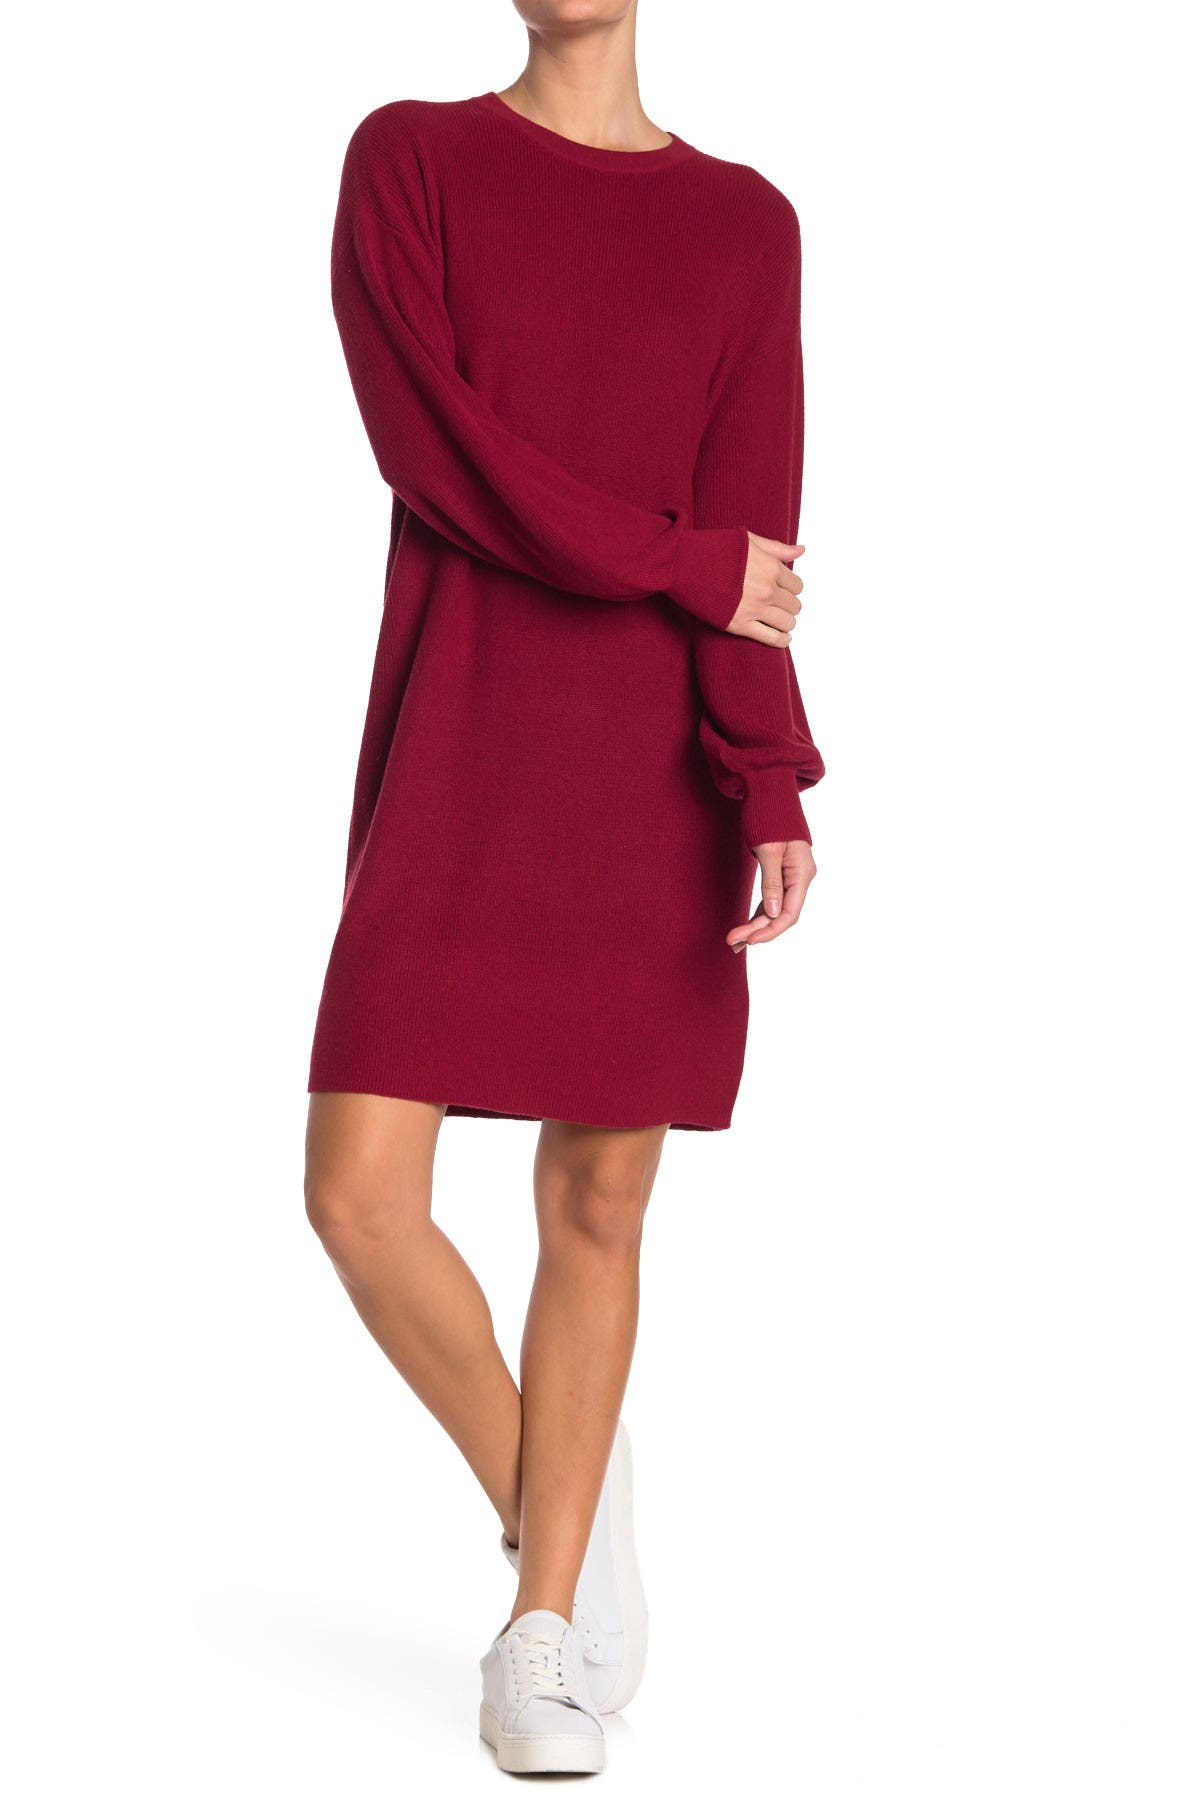 Image of Michael Stars Layla Crew Neck Sweater Dress